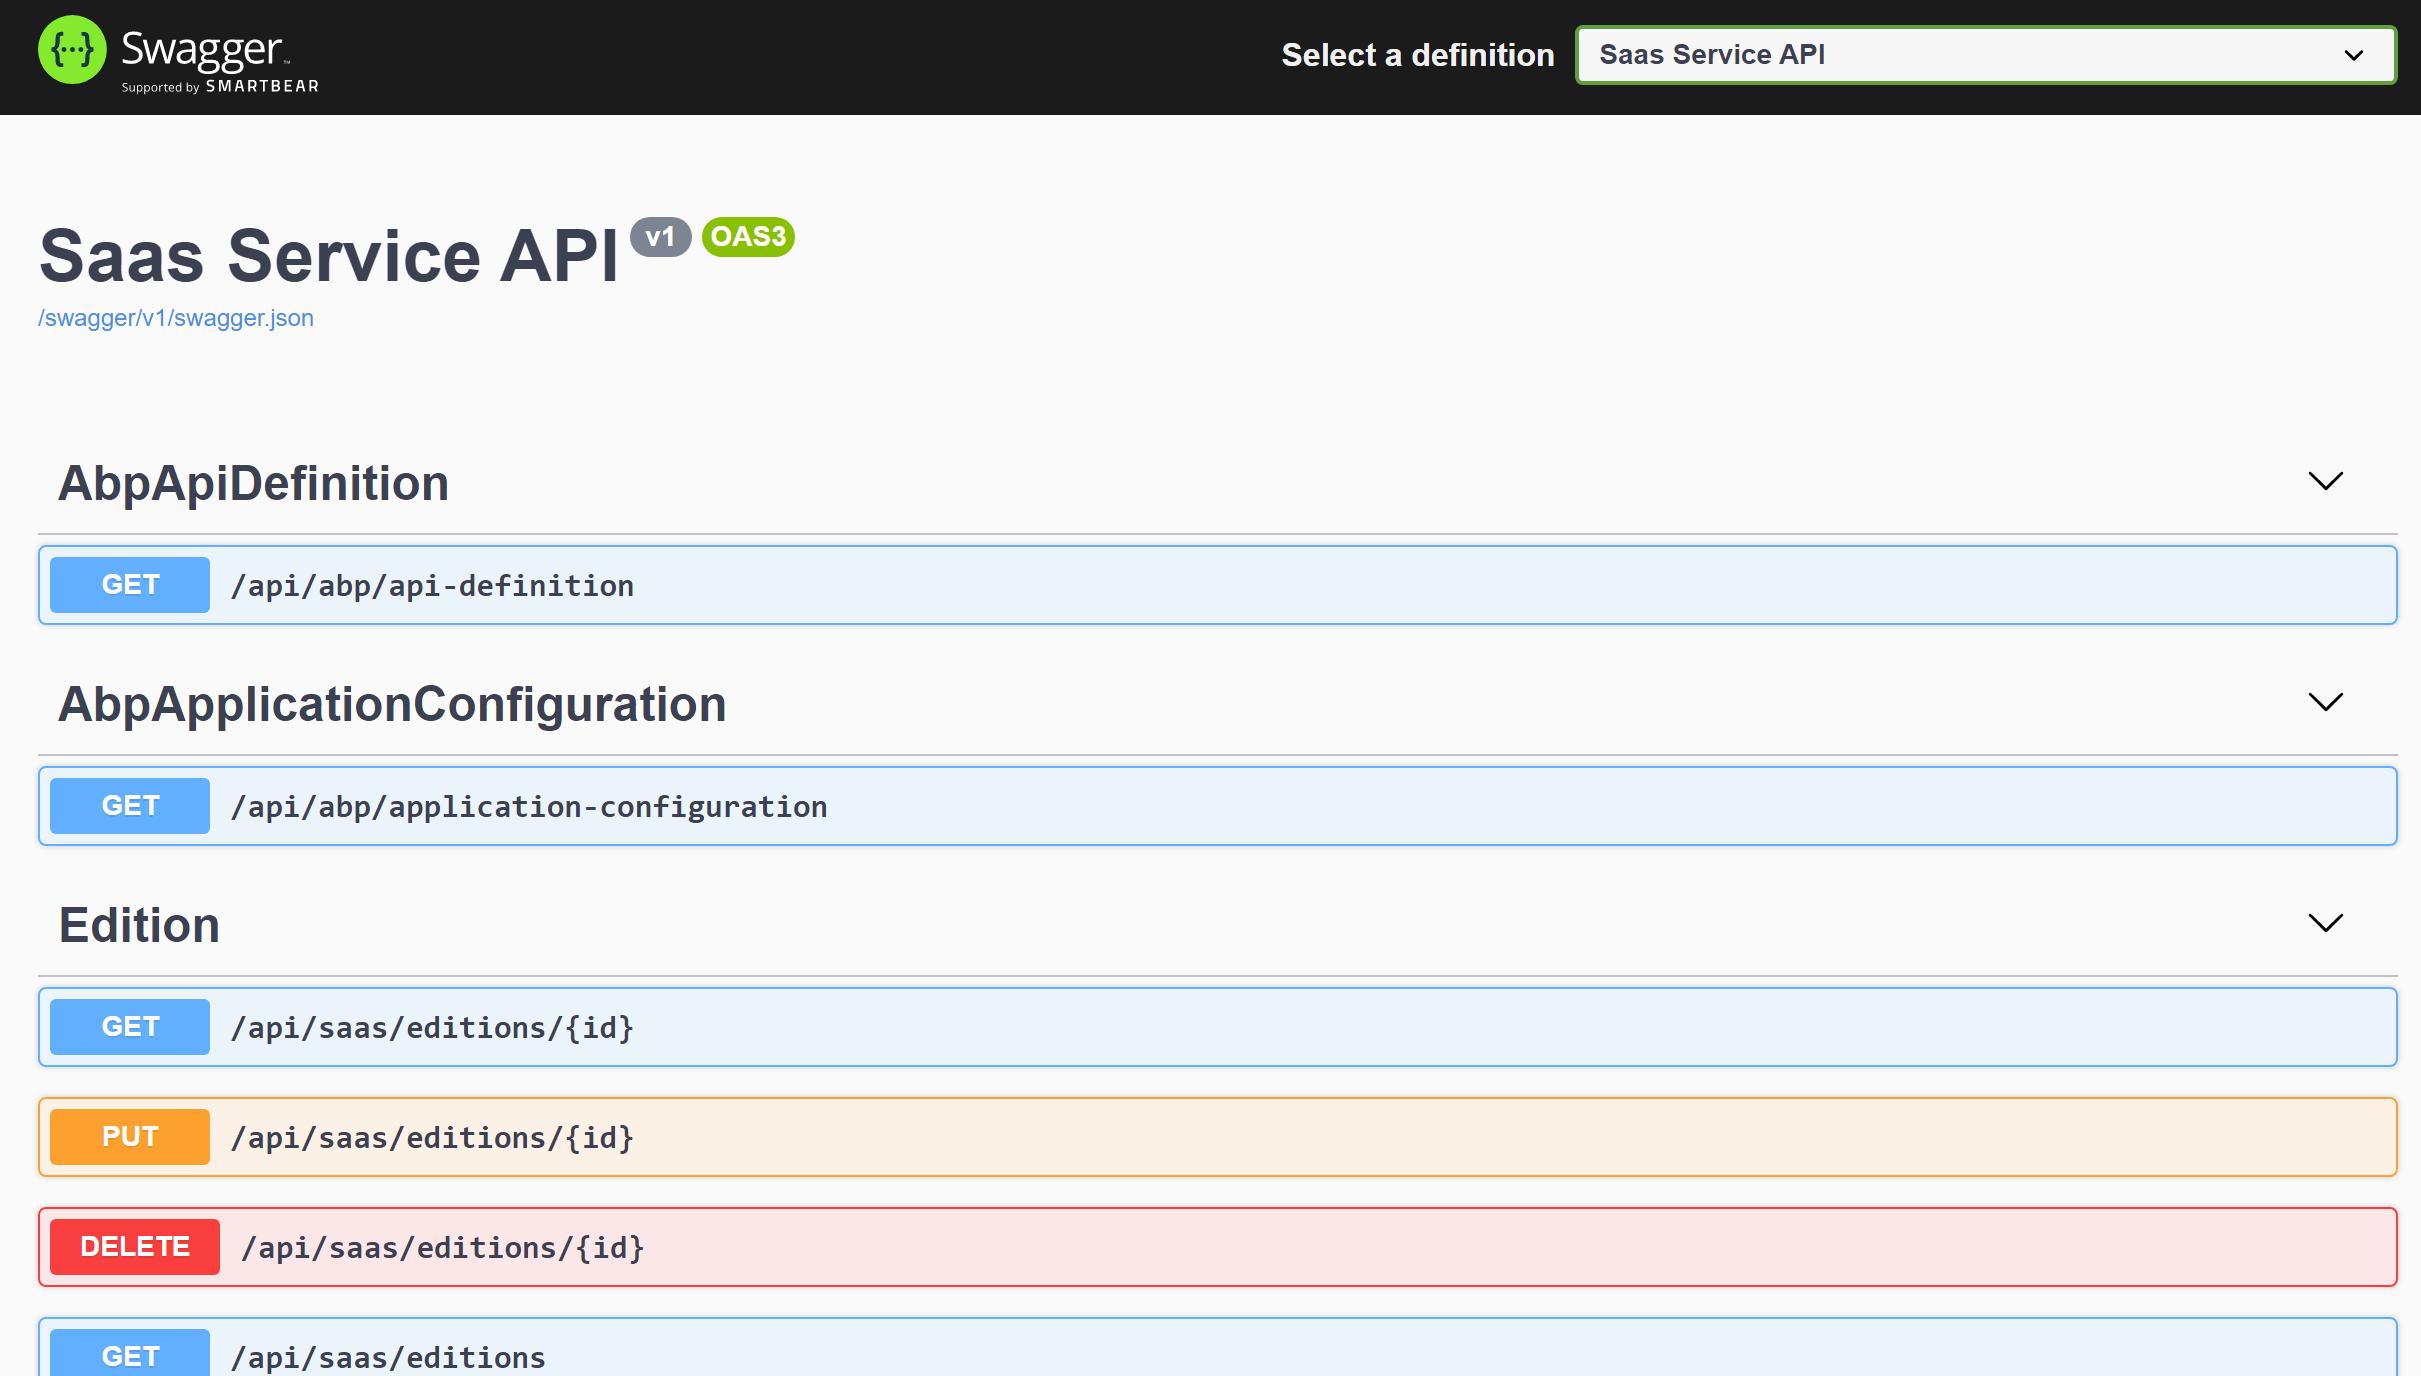 microservice-template-saas-api-swagger-ui